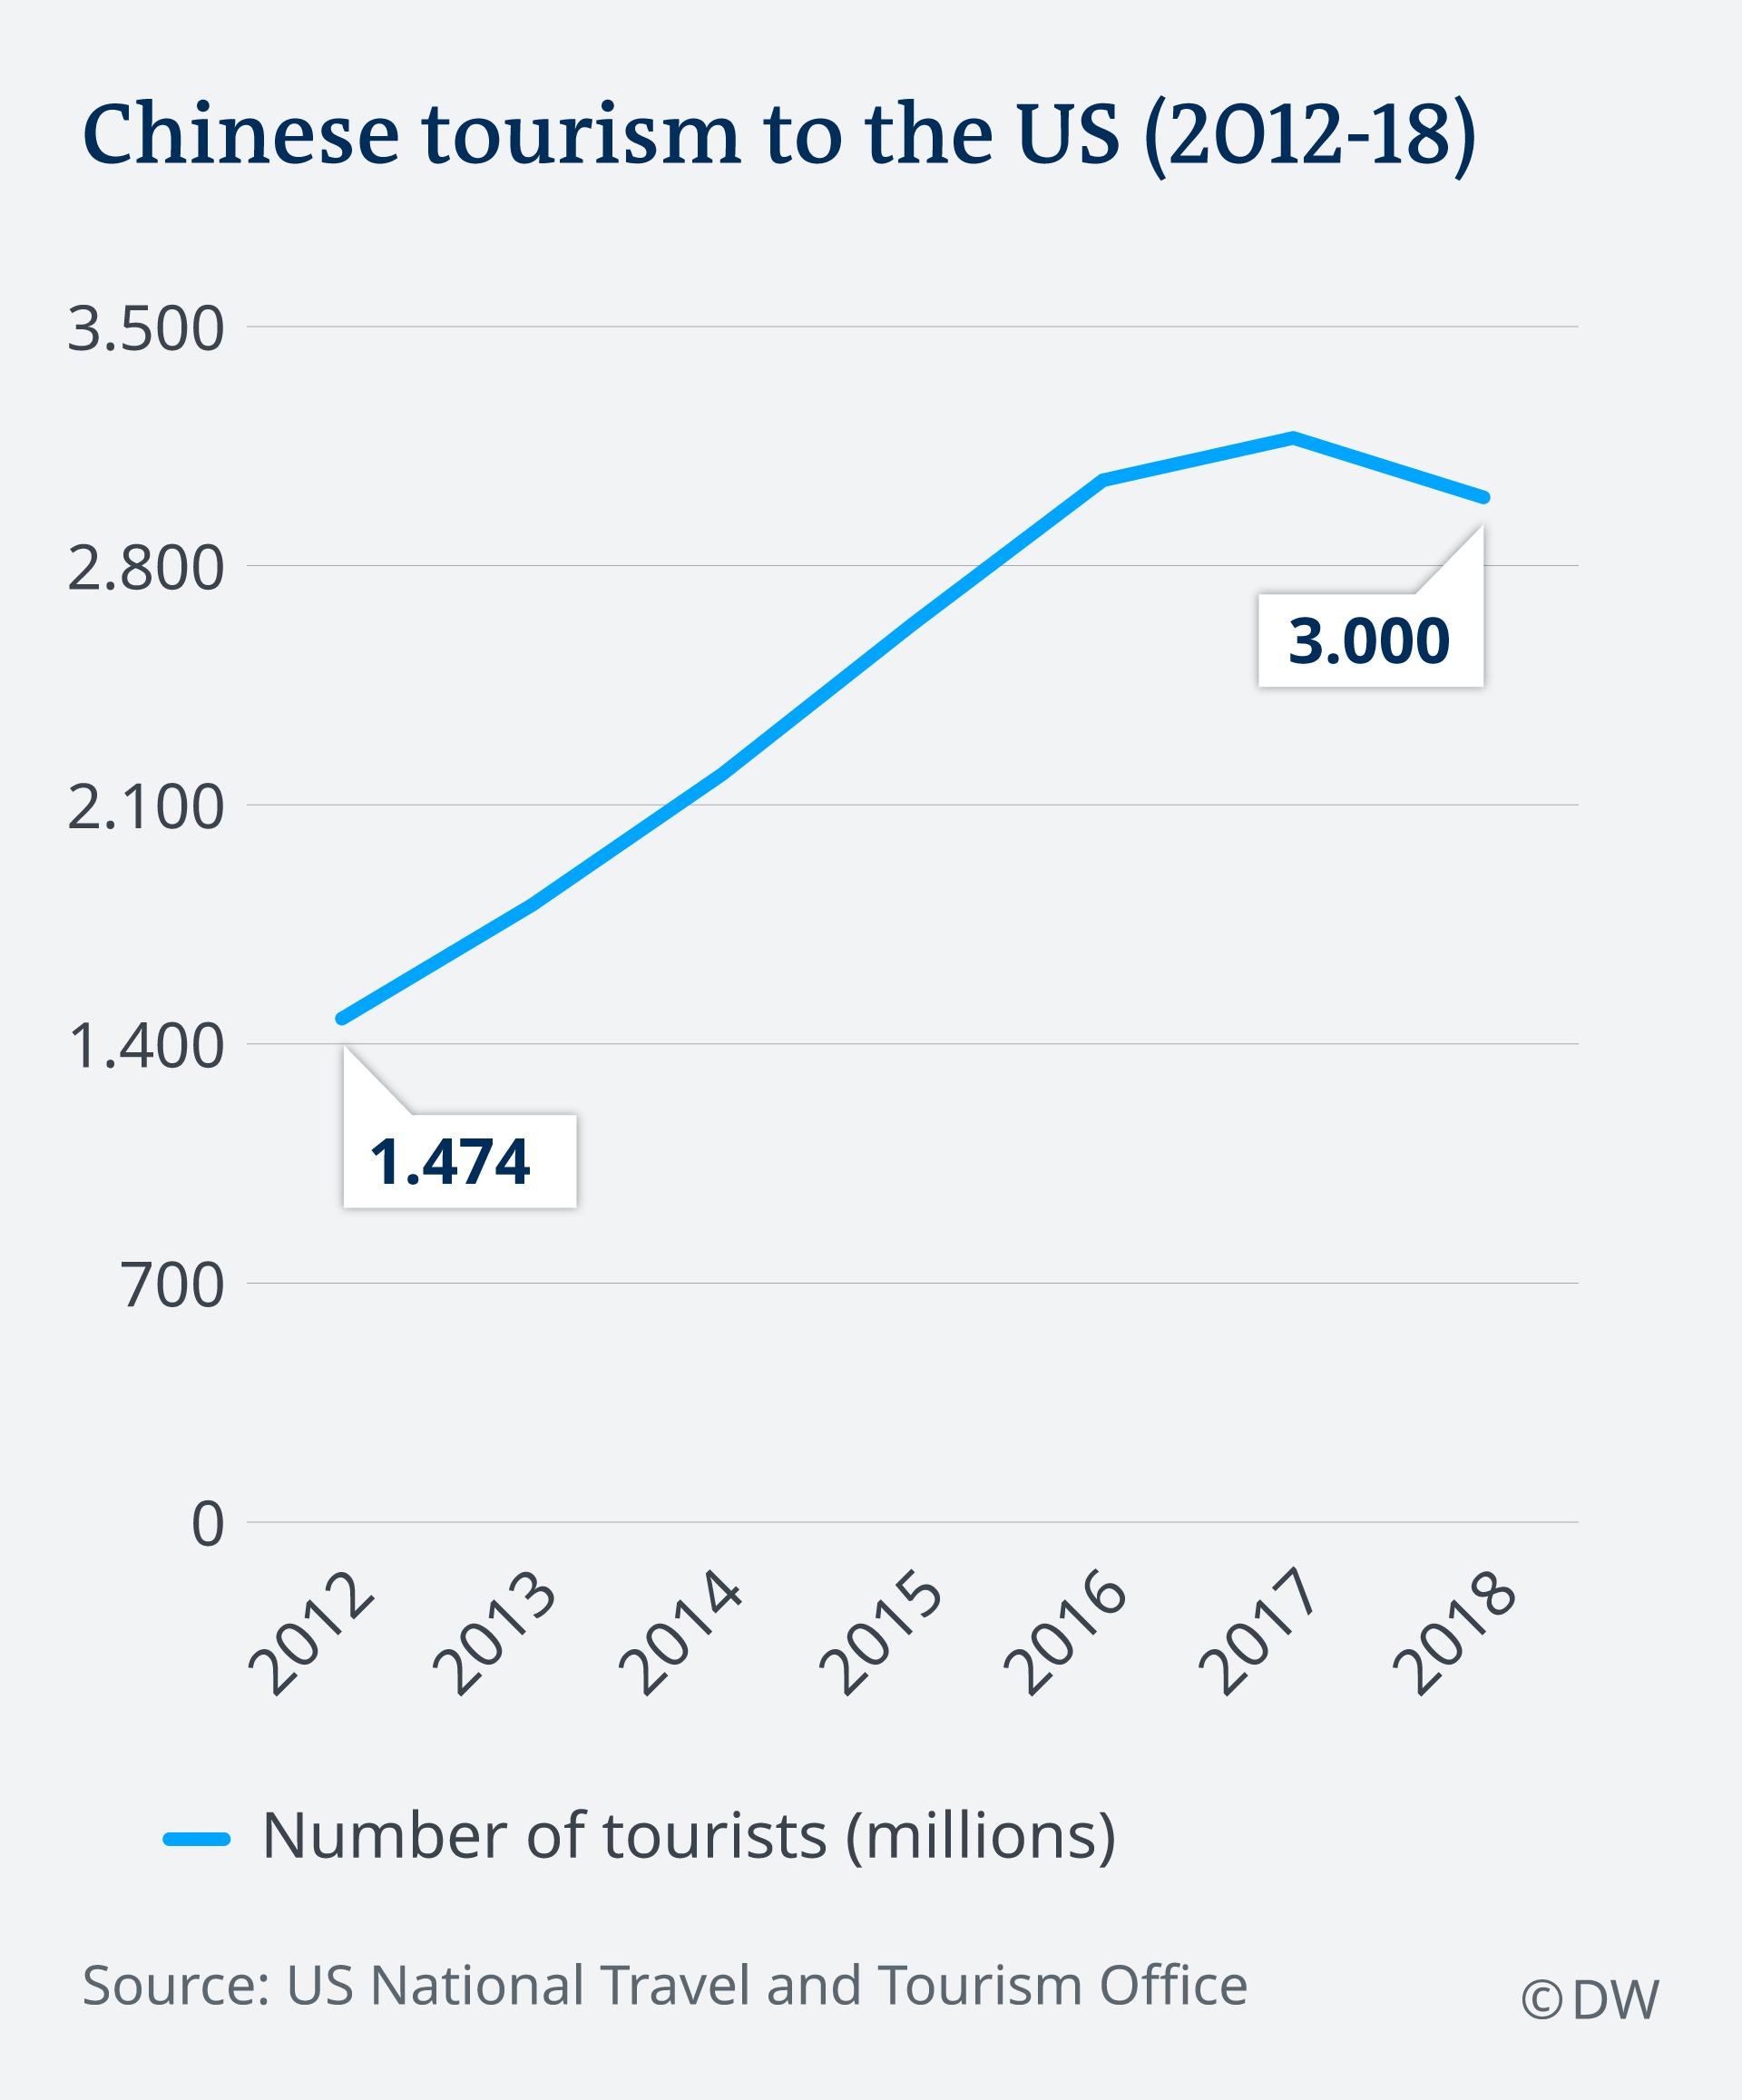 Grafik showing Chinese tourism to the US falling